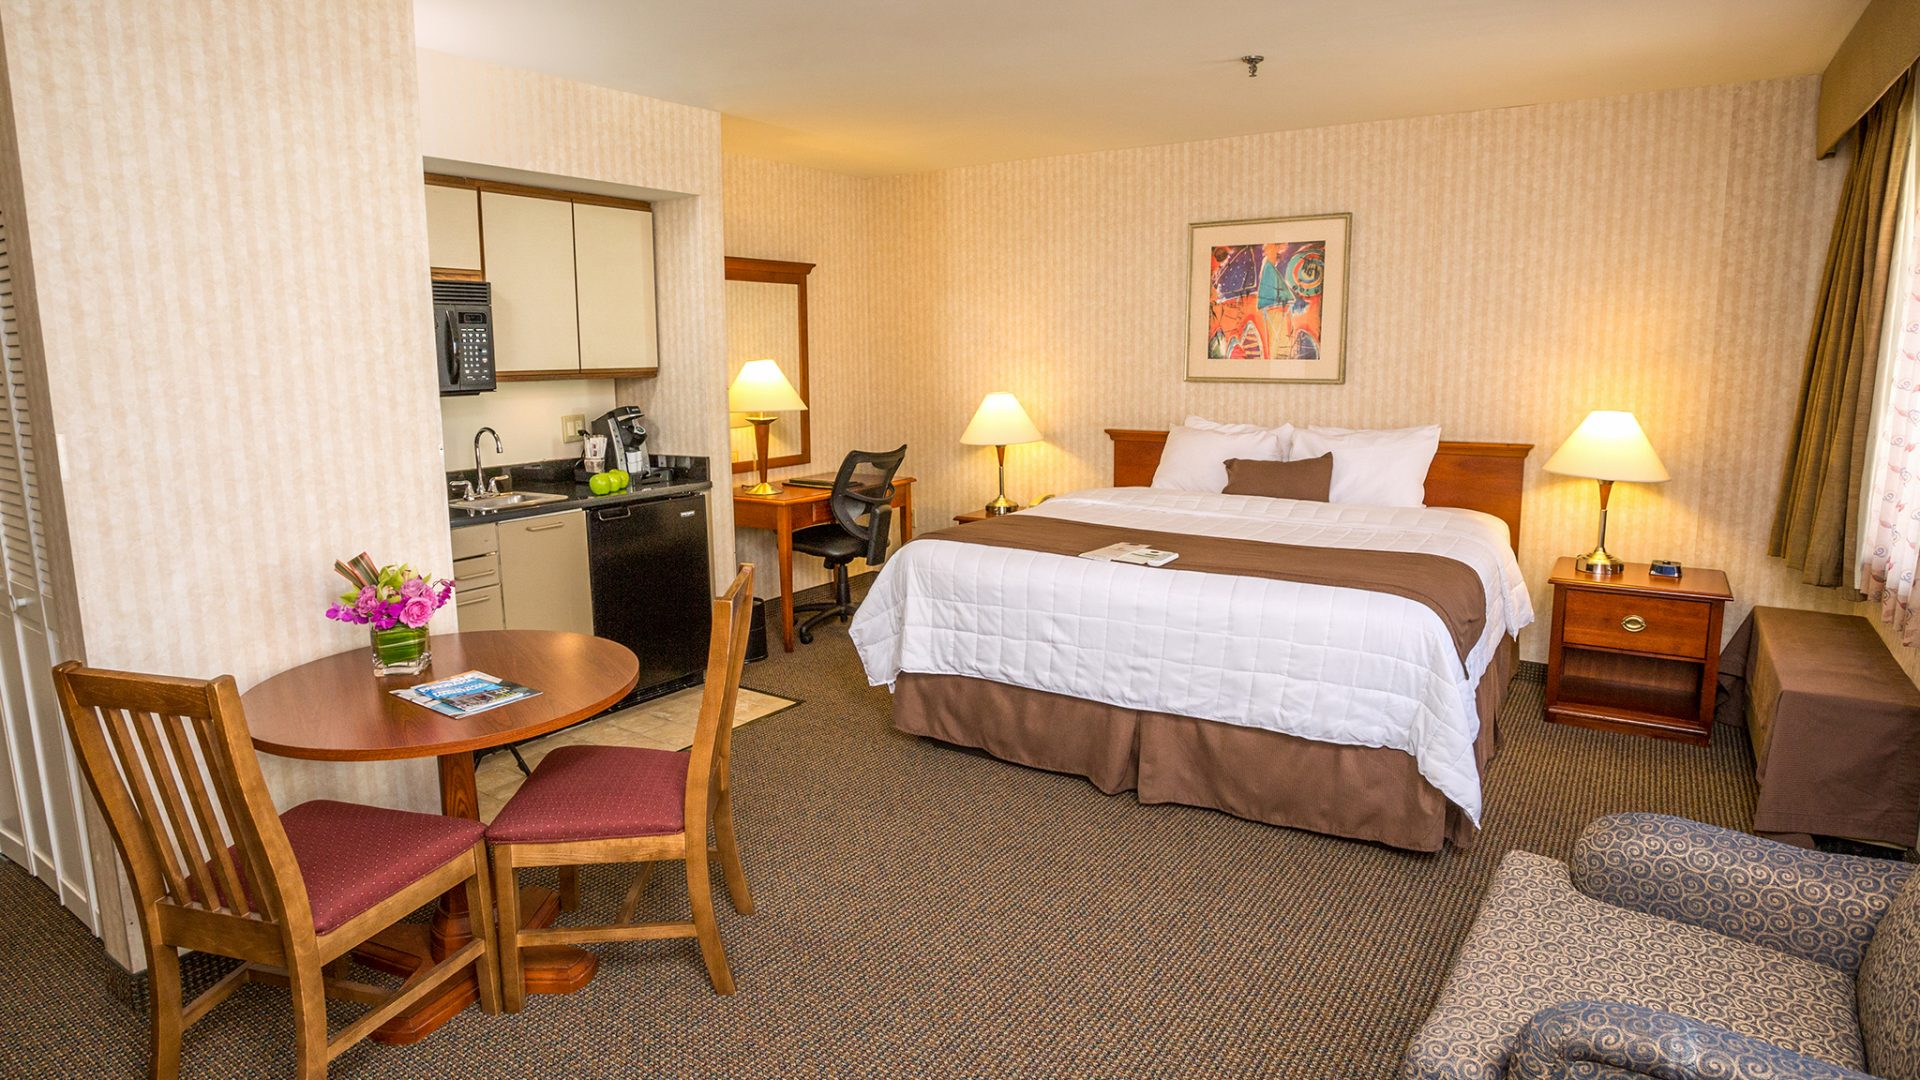 The Inn at Longwood Medical image 0